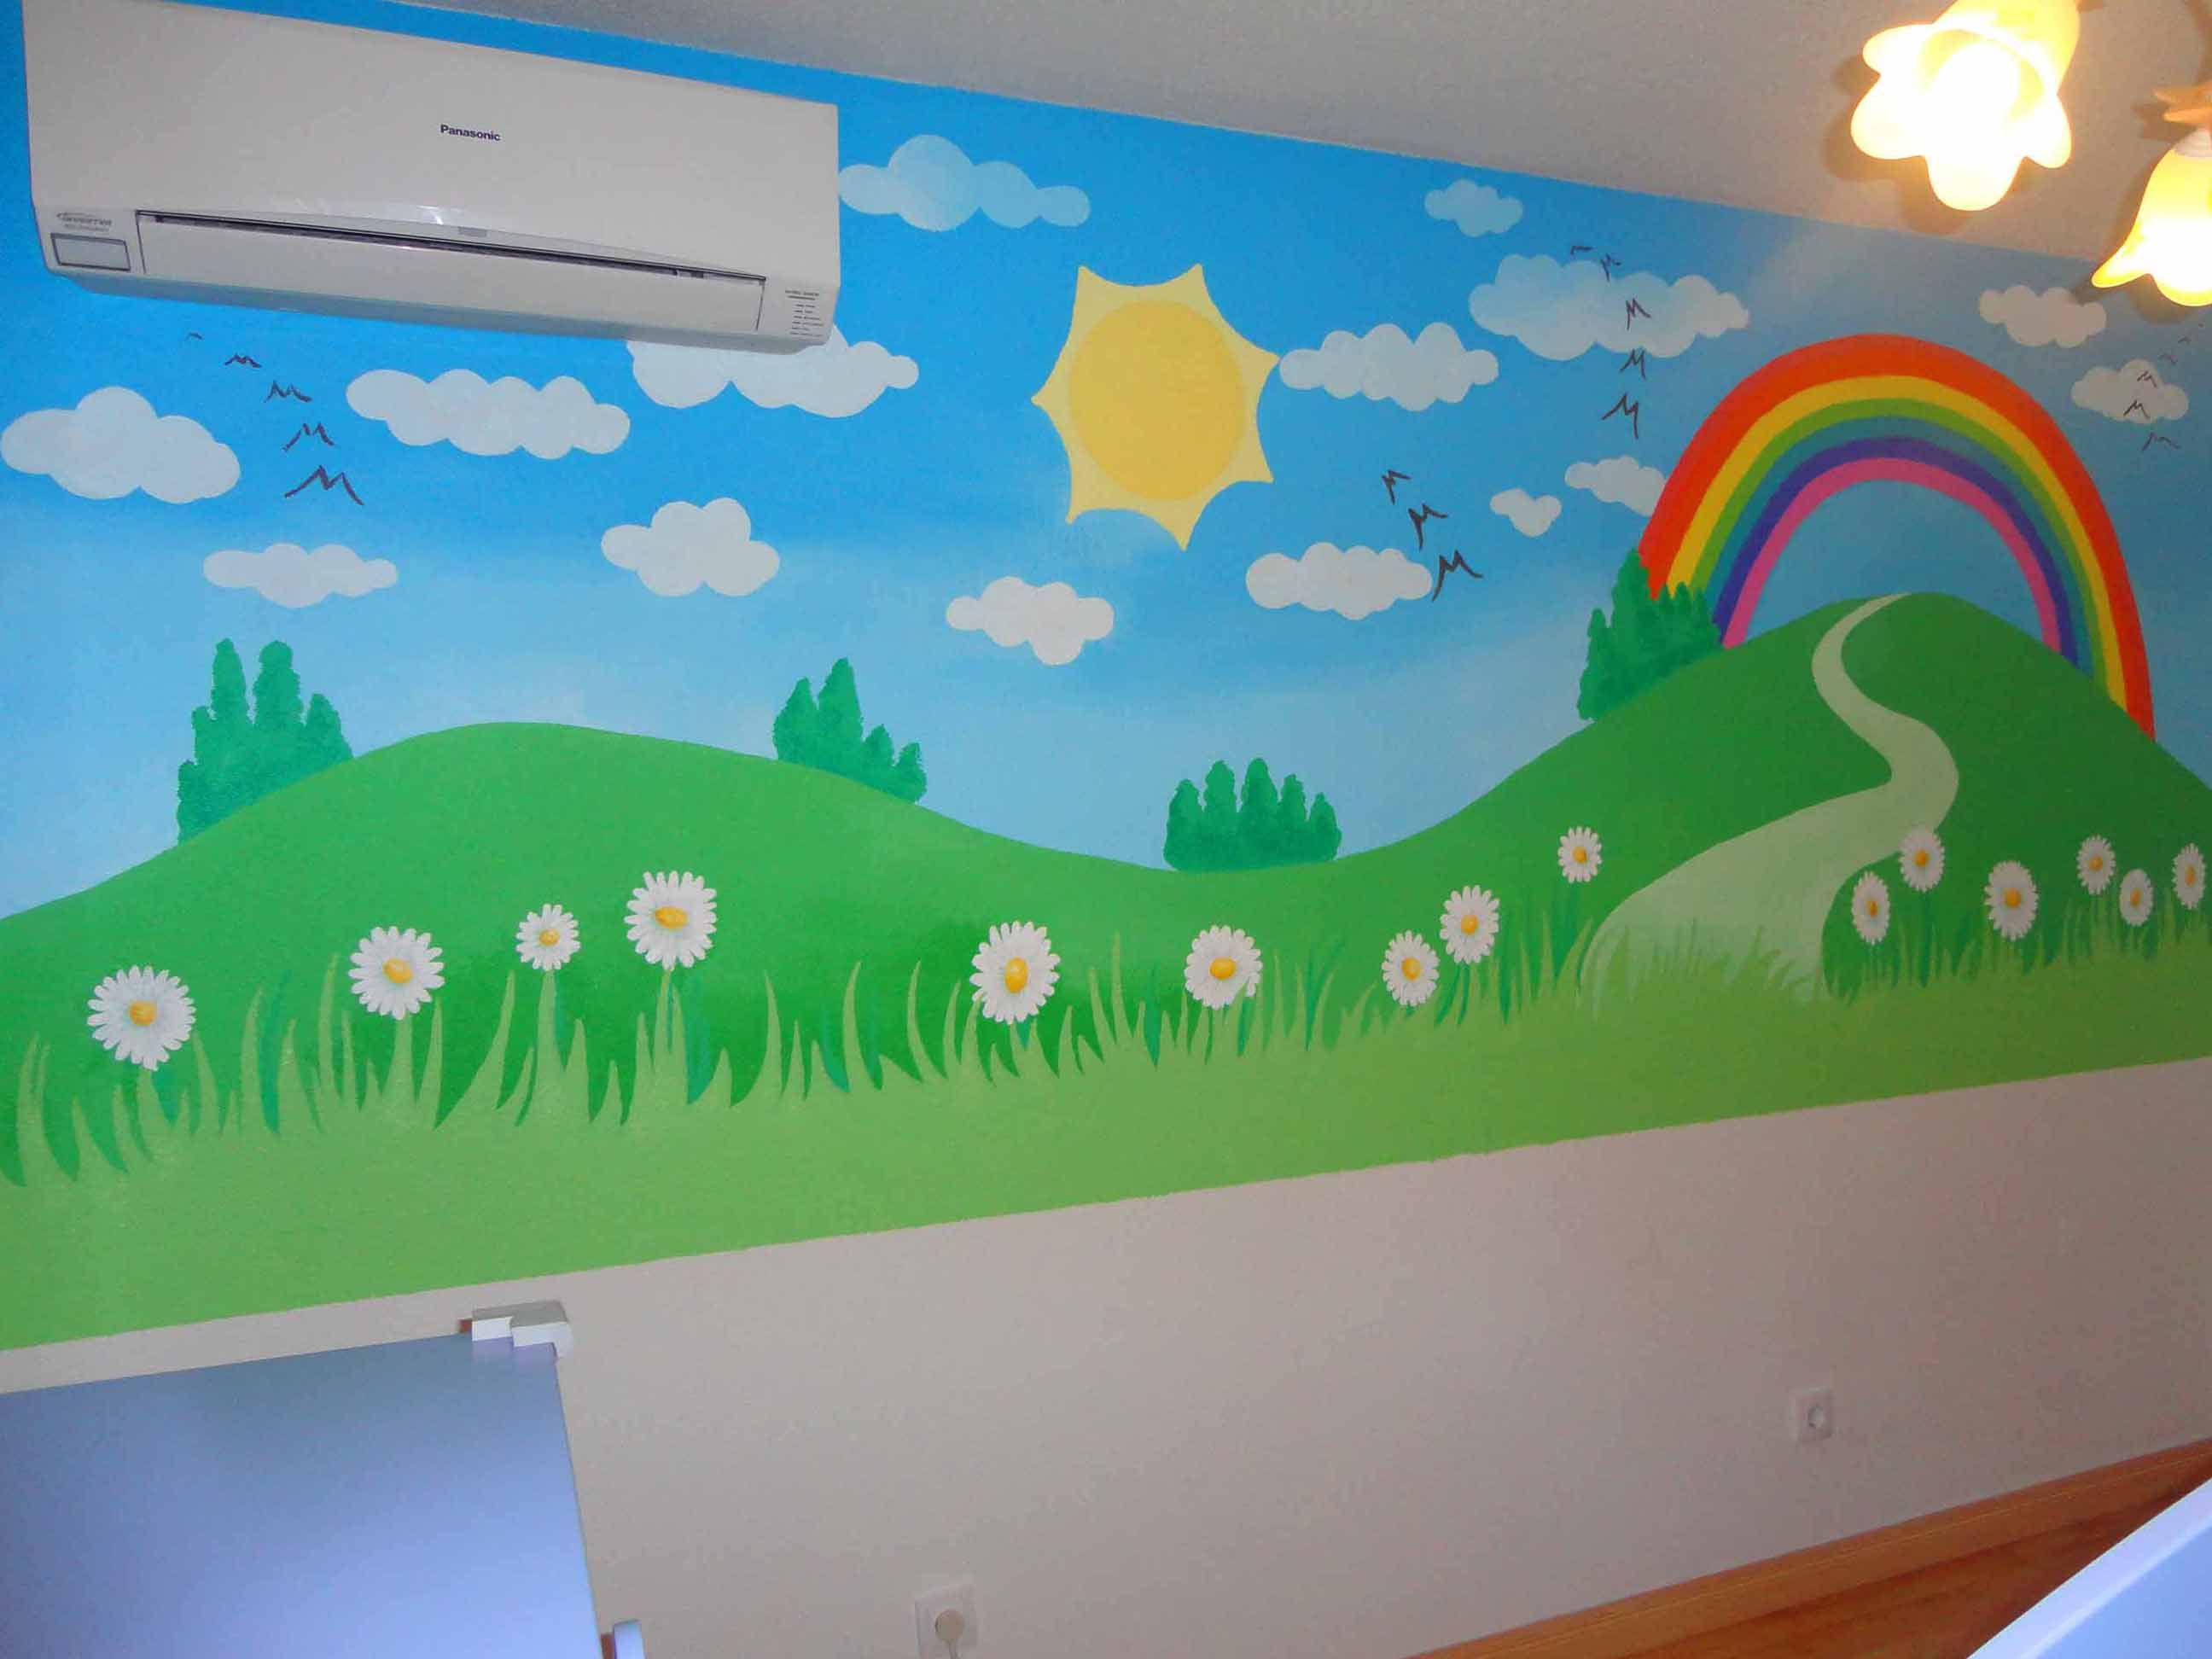 Paisajes para pintar en una pared buscar con google - Pintar paredes infantiles ...